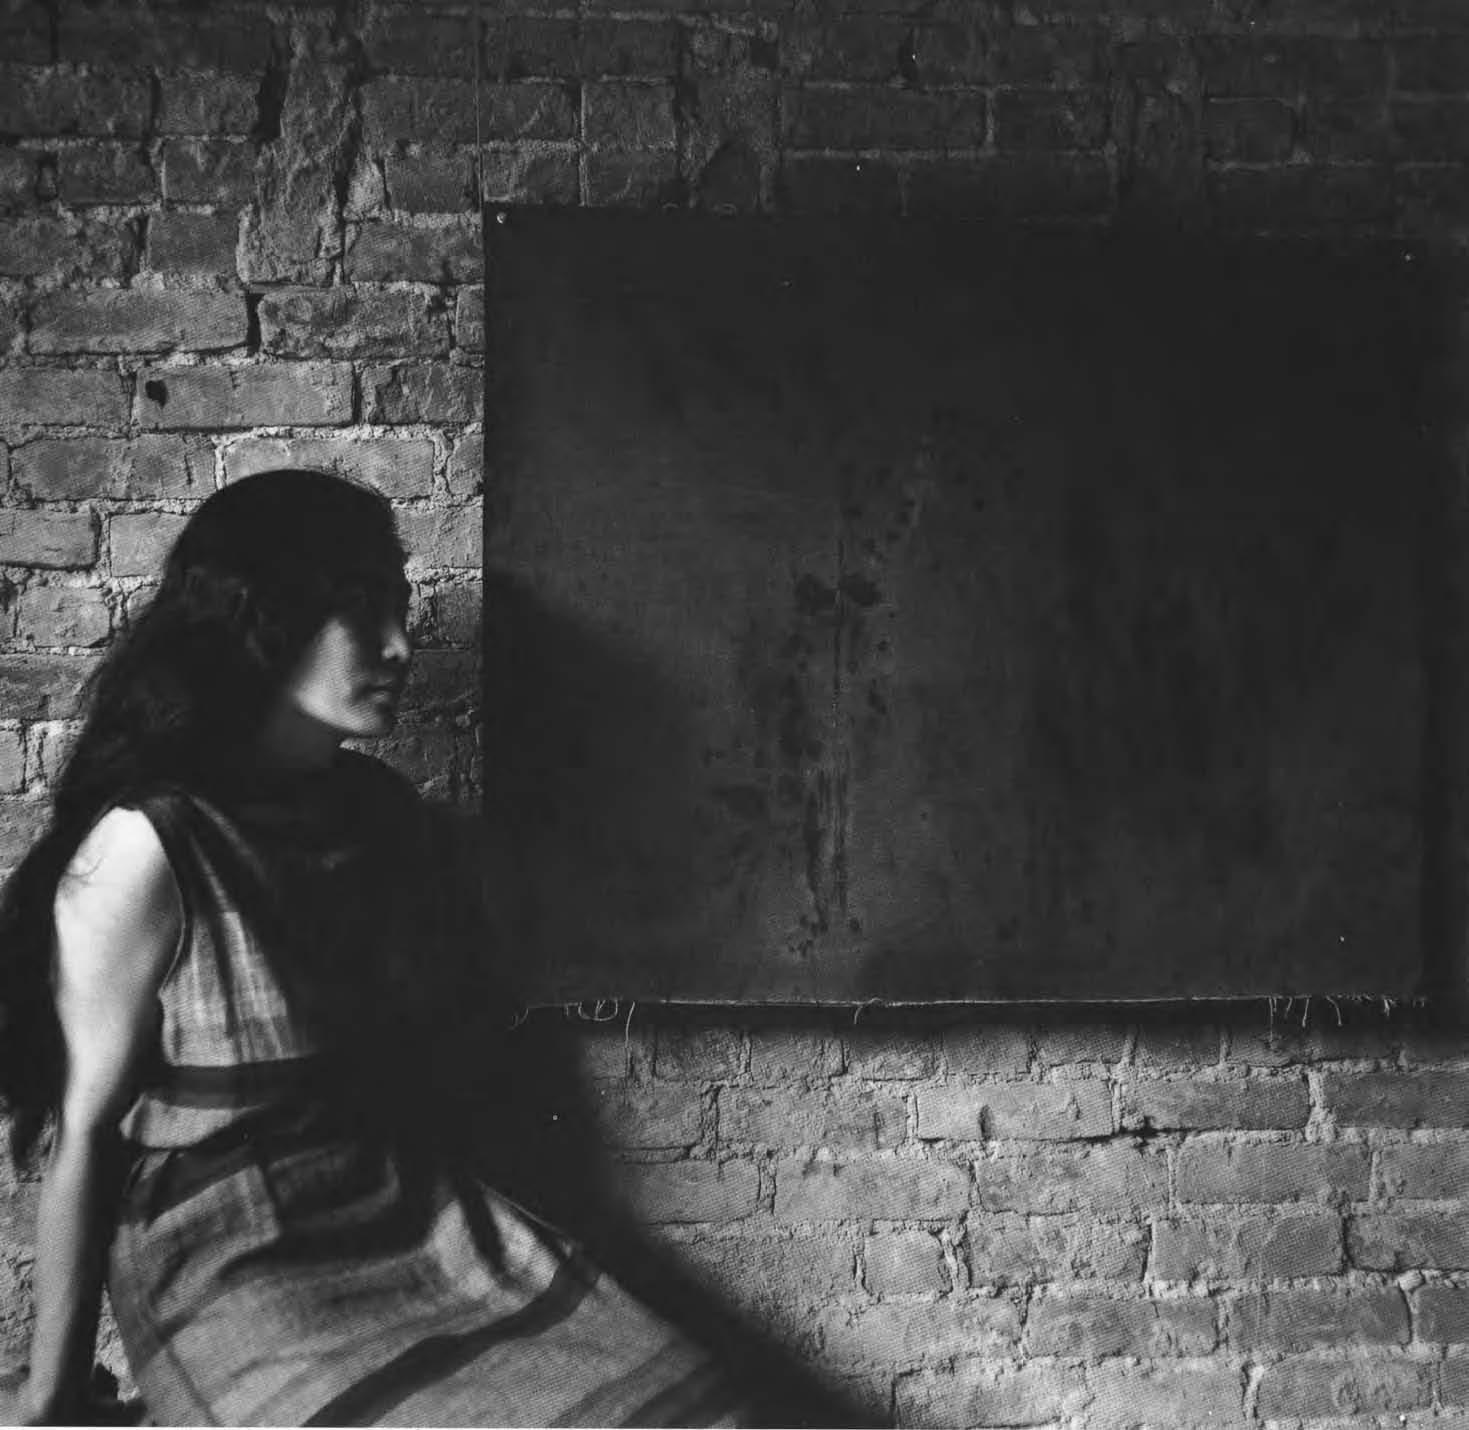 Yoko Ono 1950 Although yoko ono sYoko Ono 1950